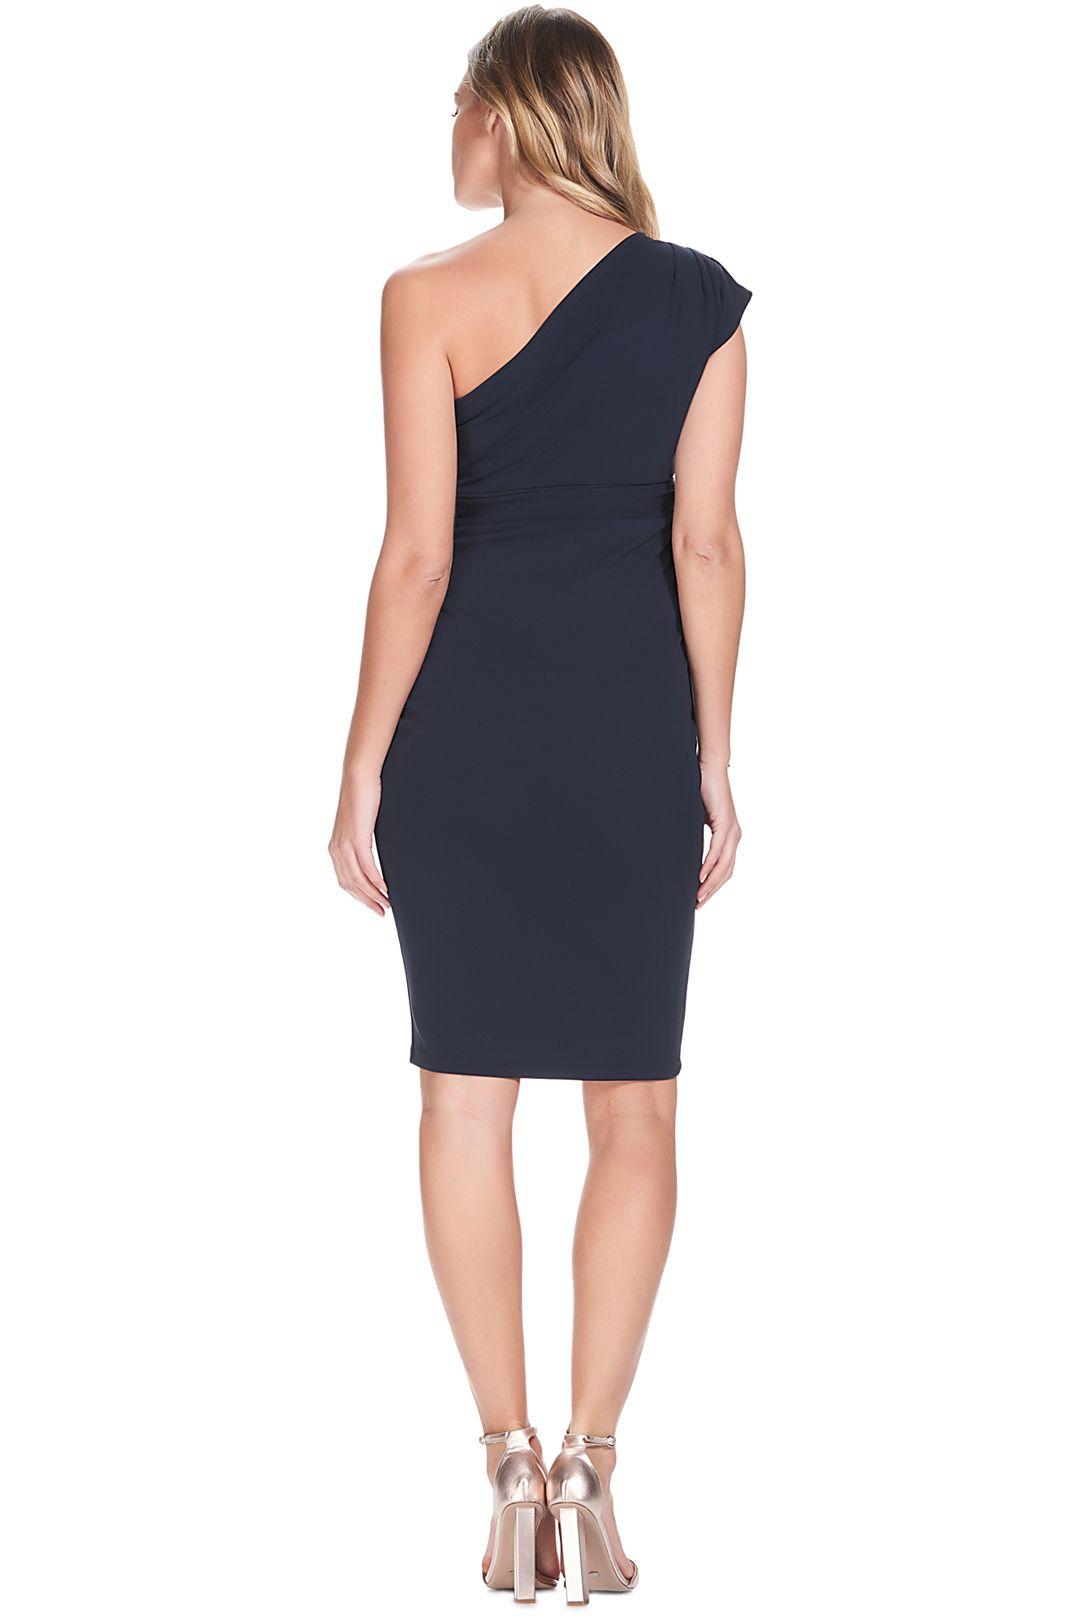 Soon-Maternity-Julia-One-Shoulder-Dress-Navy-Back